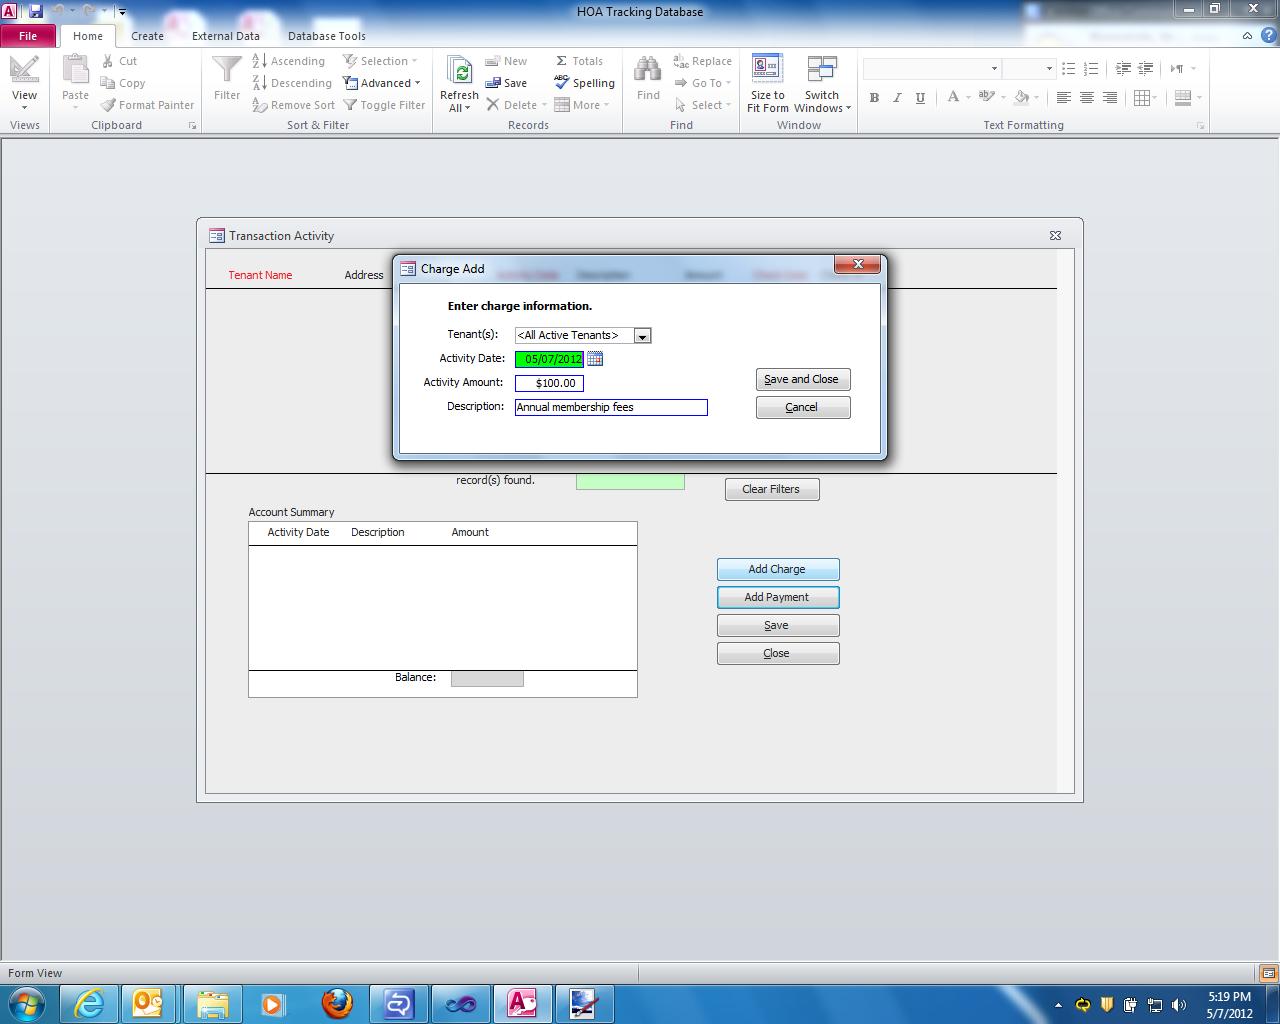 Hoa Database Software Screenshots Db Pros Cc R Template